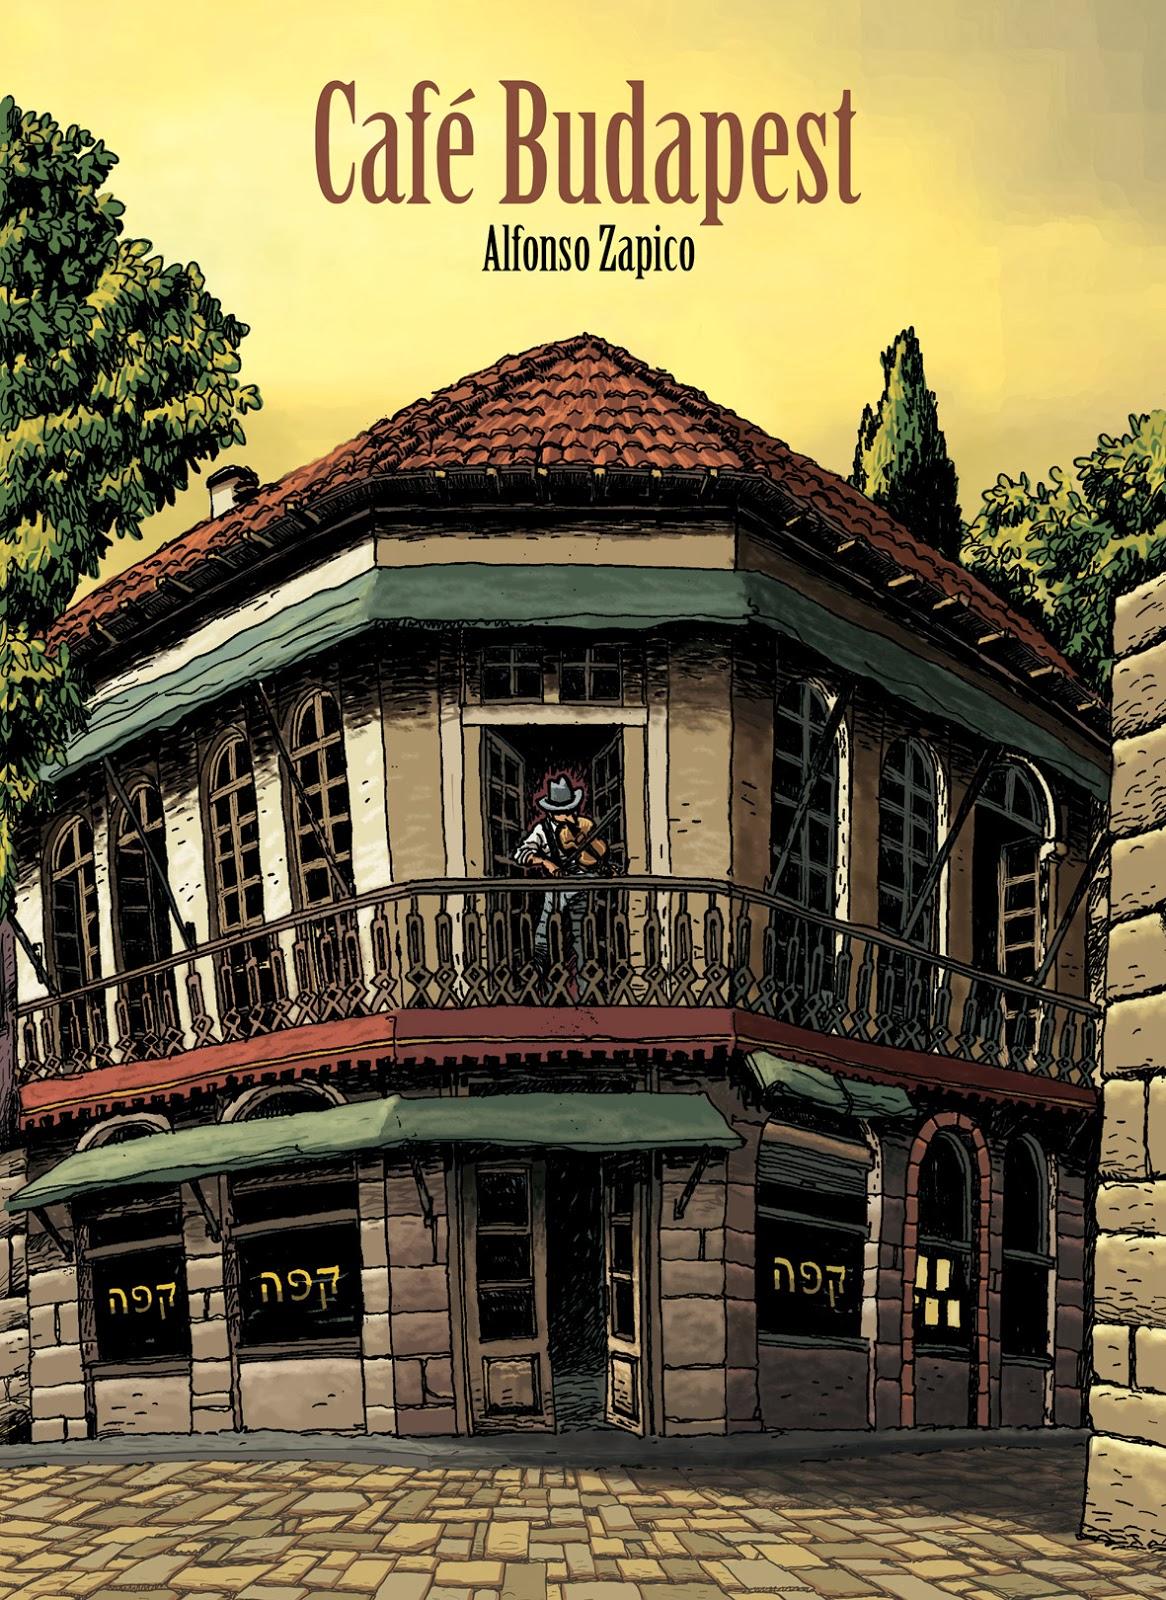 Café Budapest,Alfonso Zapico,Astiberri  tienda de comics en México distrito federal, venta de comics en México df